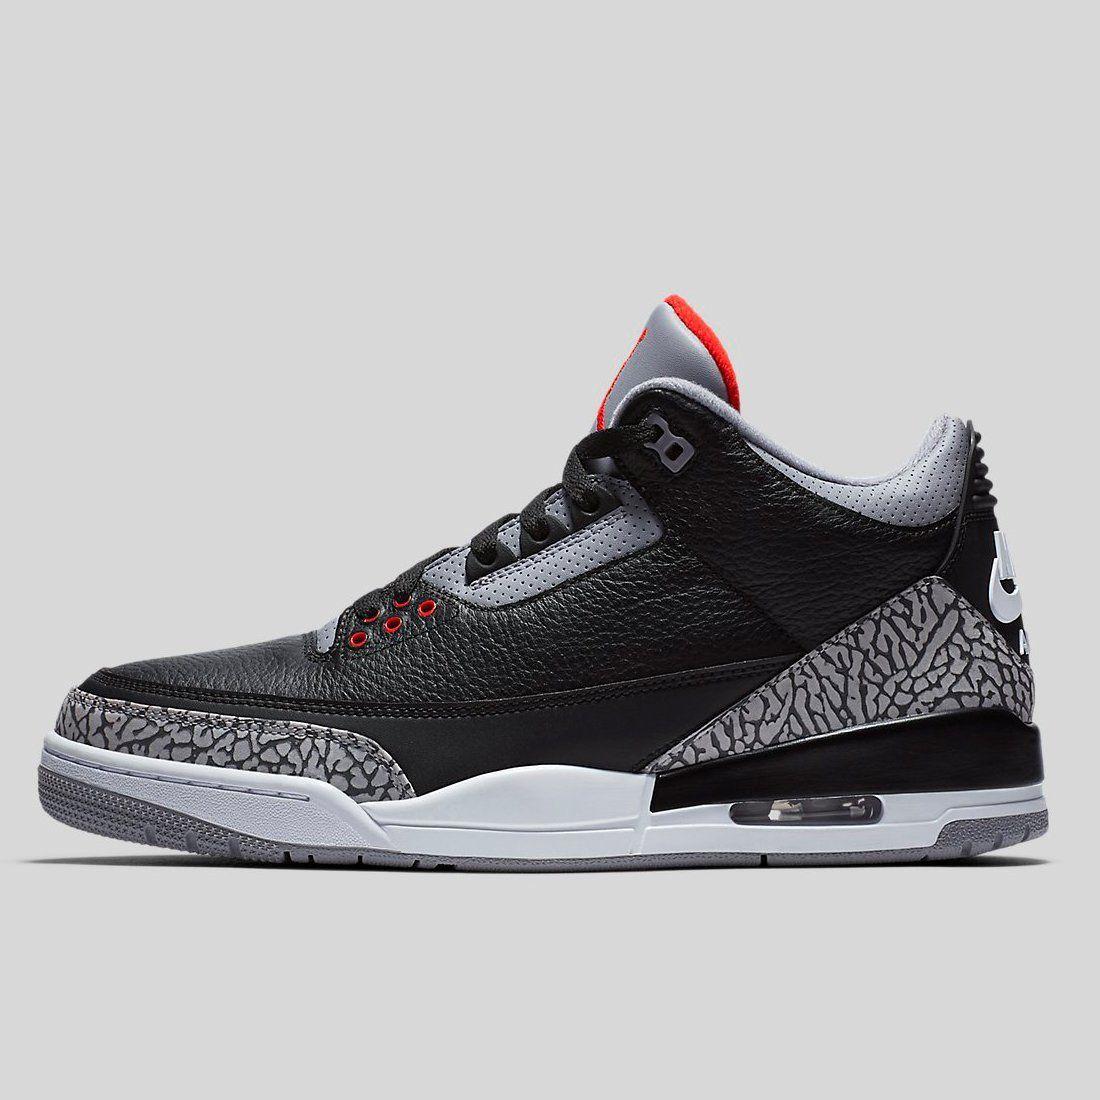 Nike Air Jordan 3 Retro Og Black Cement 2018 Air Jordans Retro Air Jordans Nike Air Jordan Retro